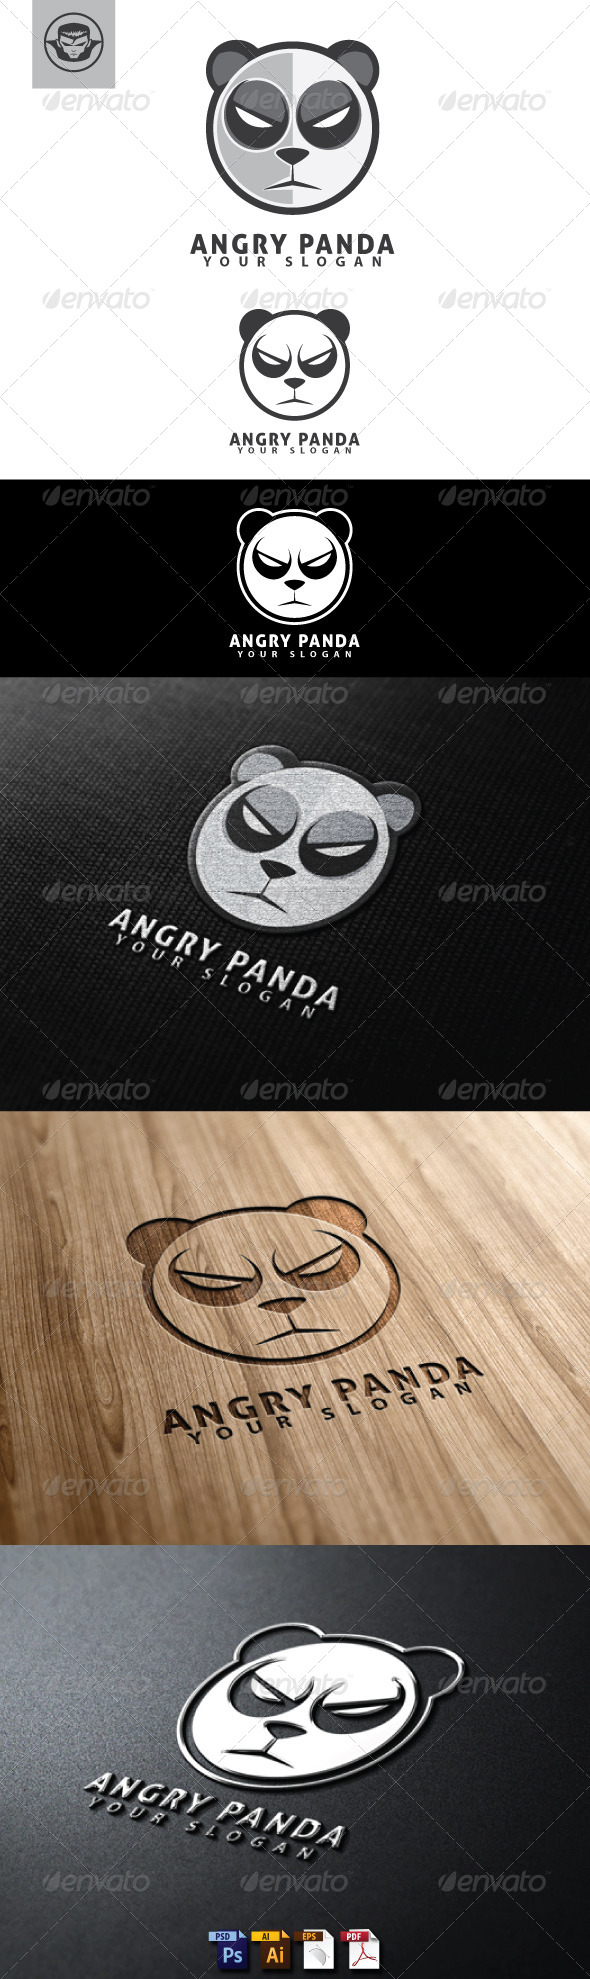 GraphicRiver Angry Panda Logo Template 4786697